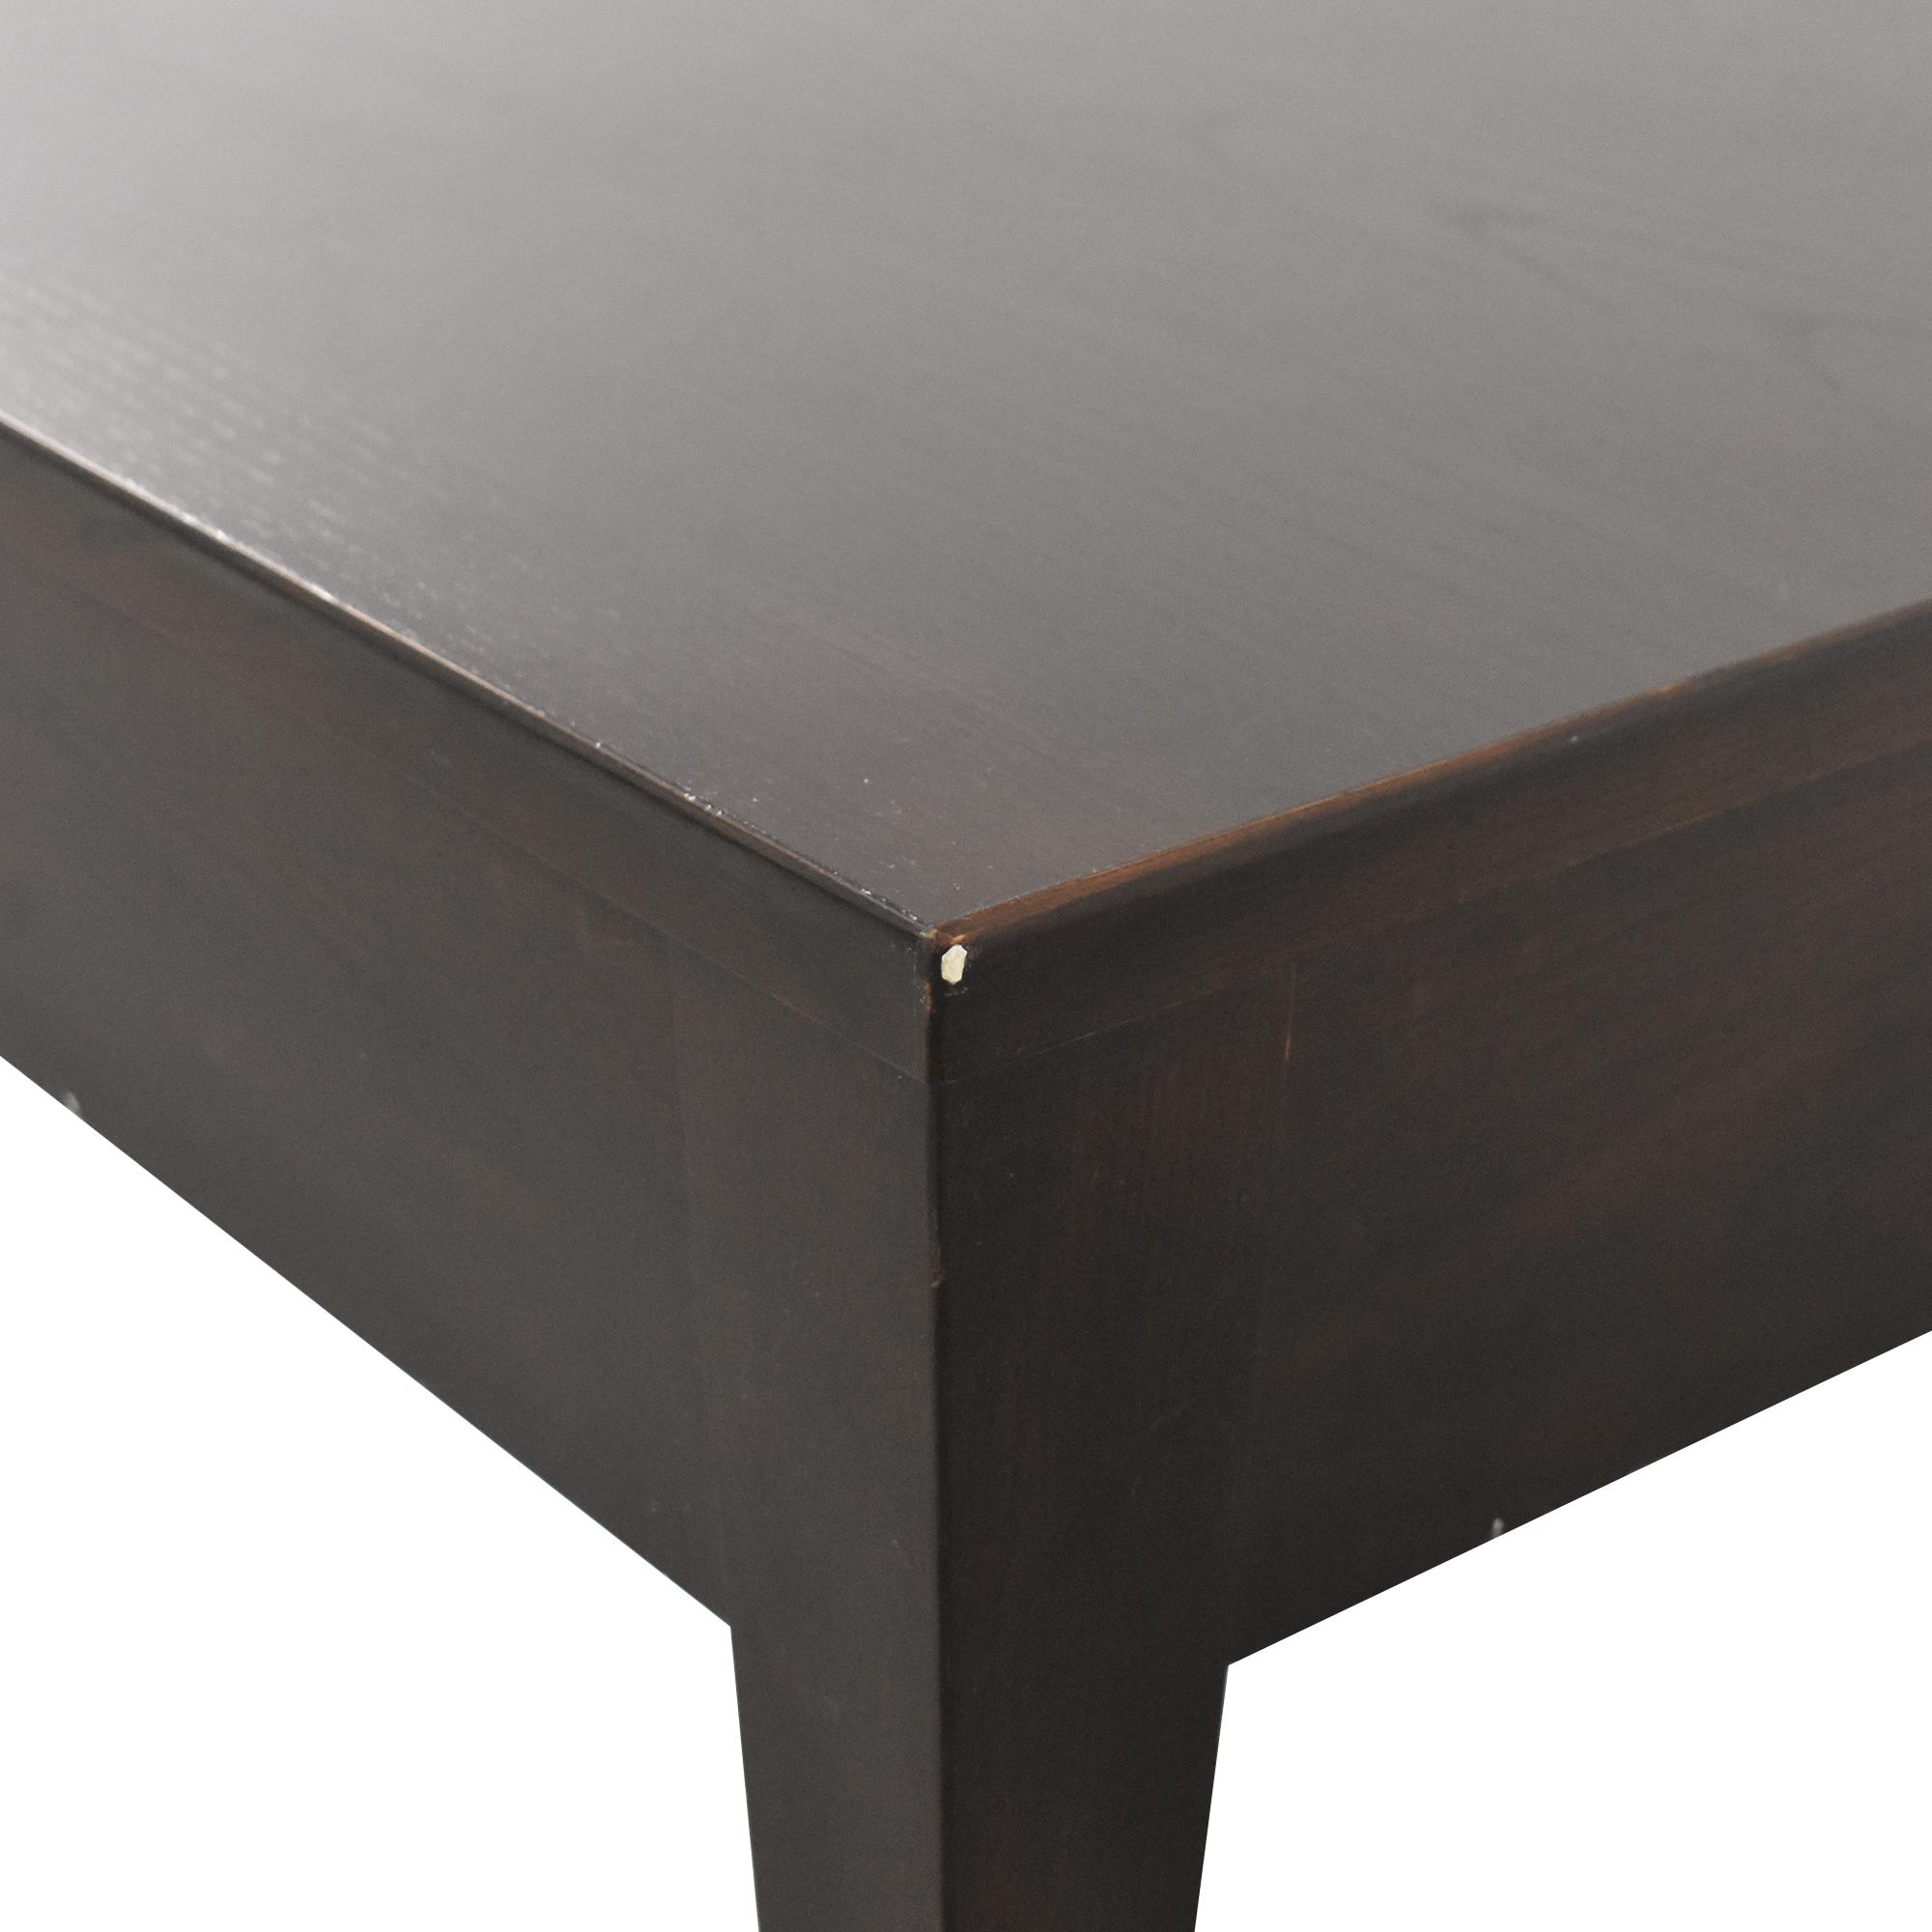 Ethan Allen Ethan Allen Single Drawer End Table ct